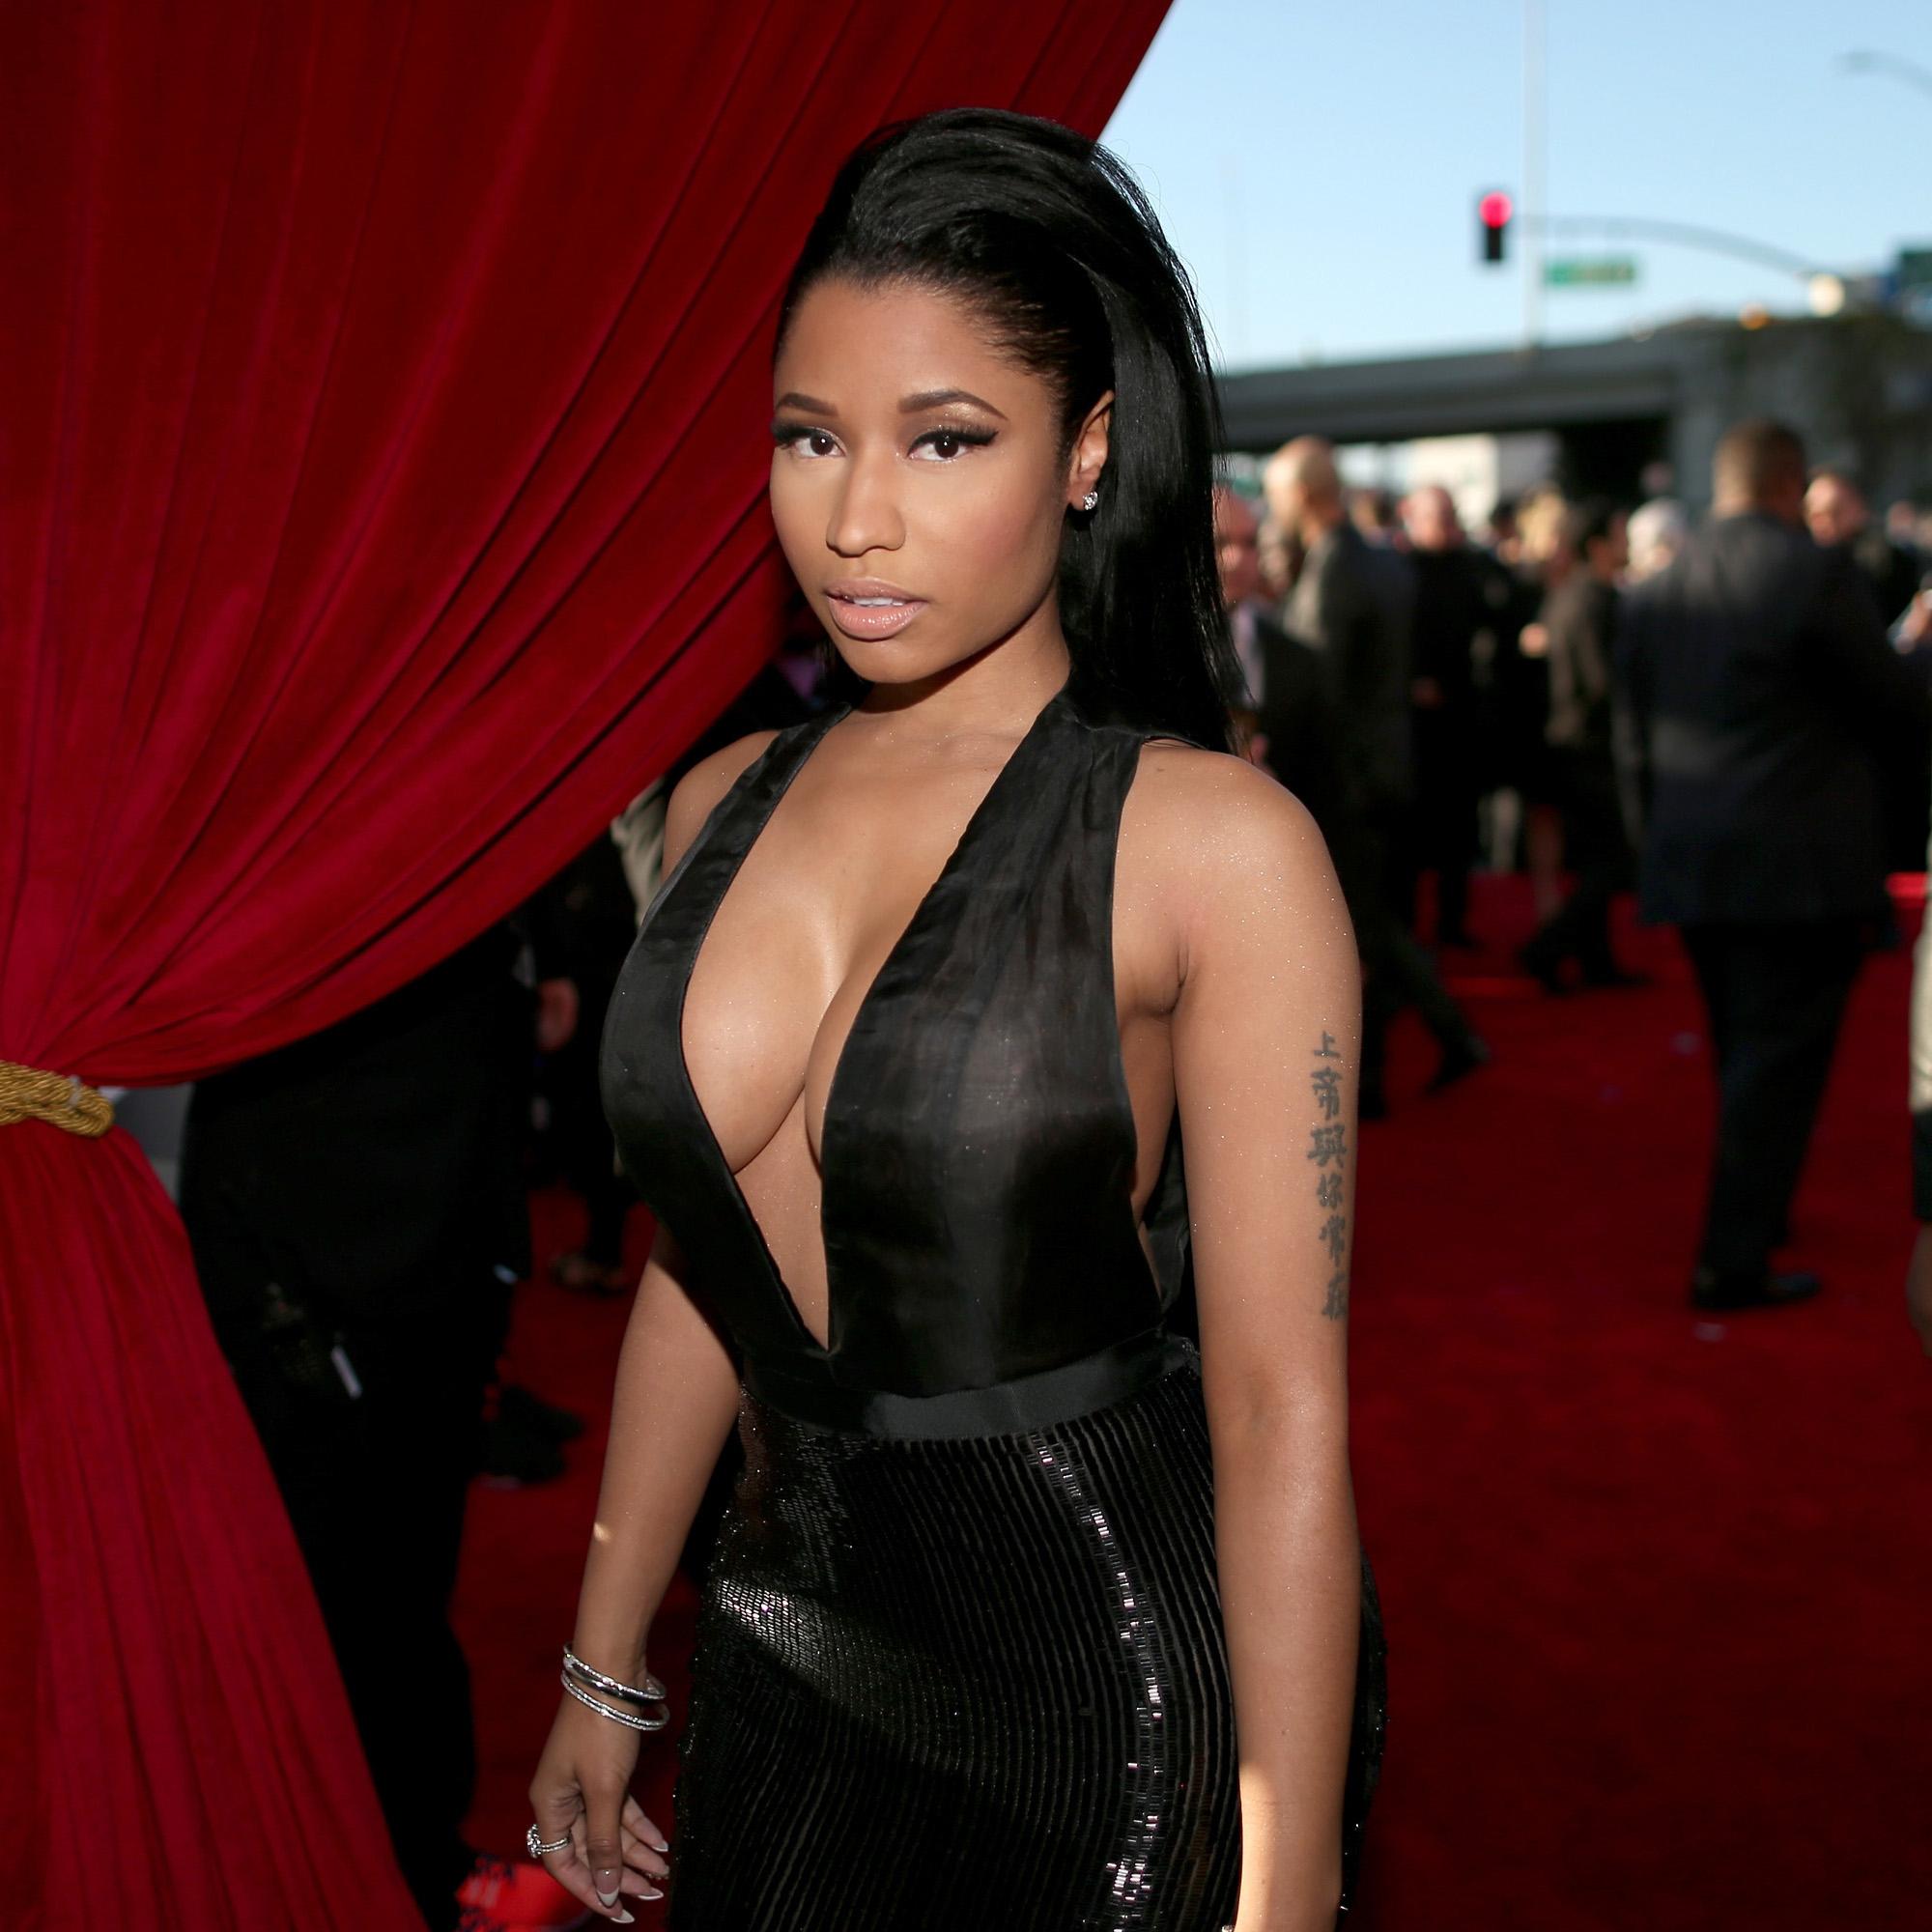 HQ Nicki Minaj Wallpapers   File 582.58Kb